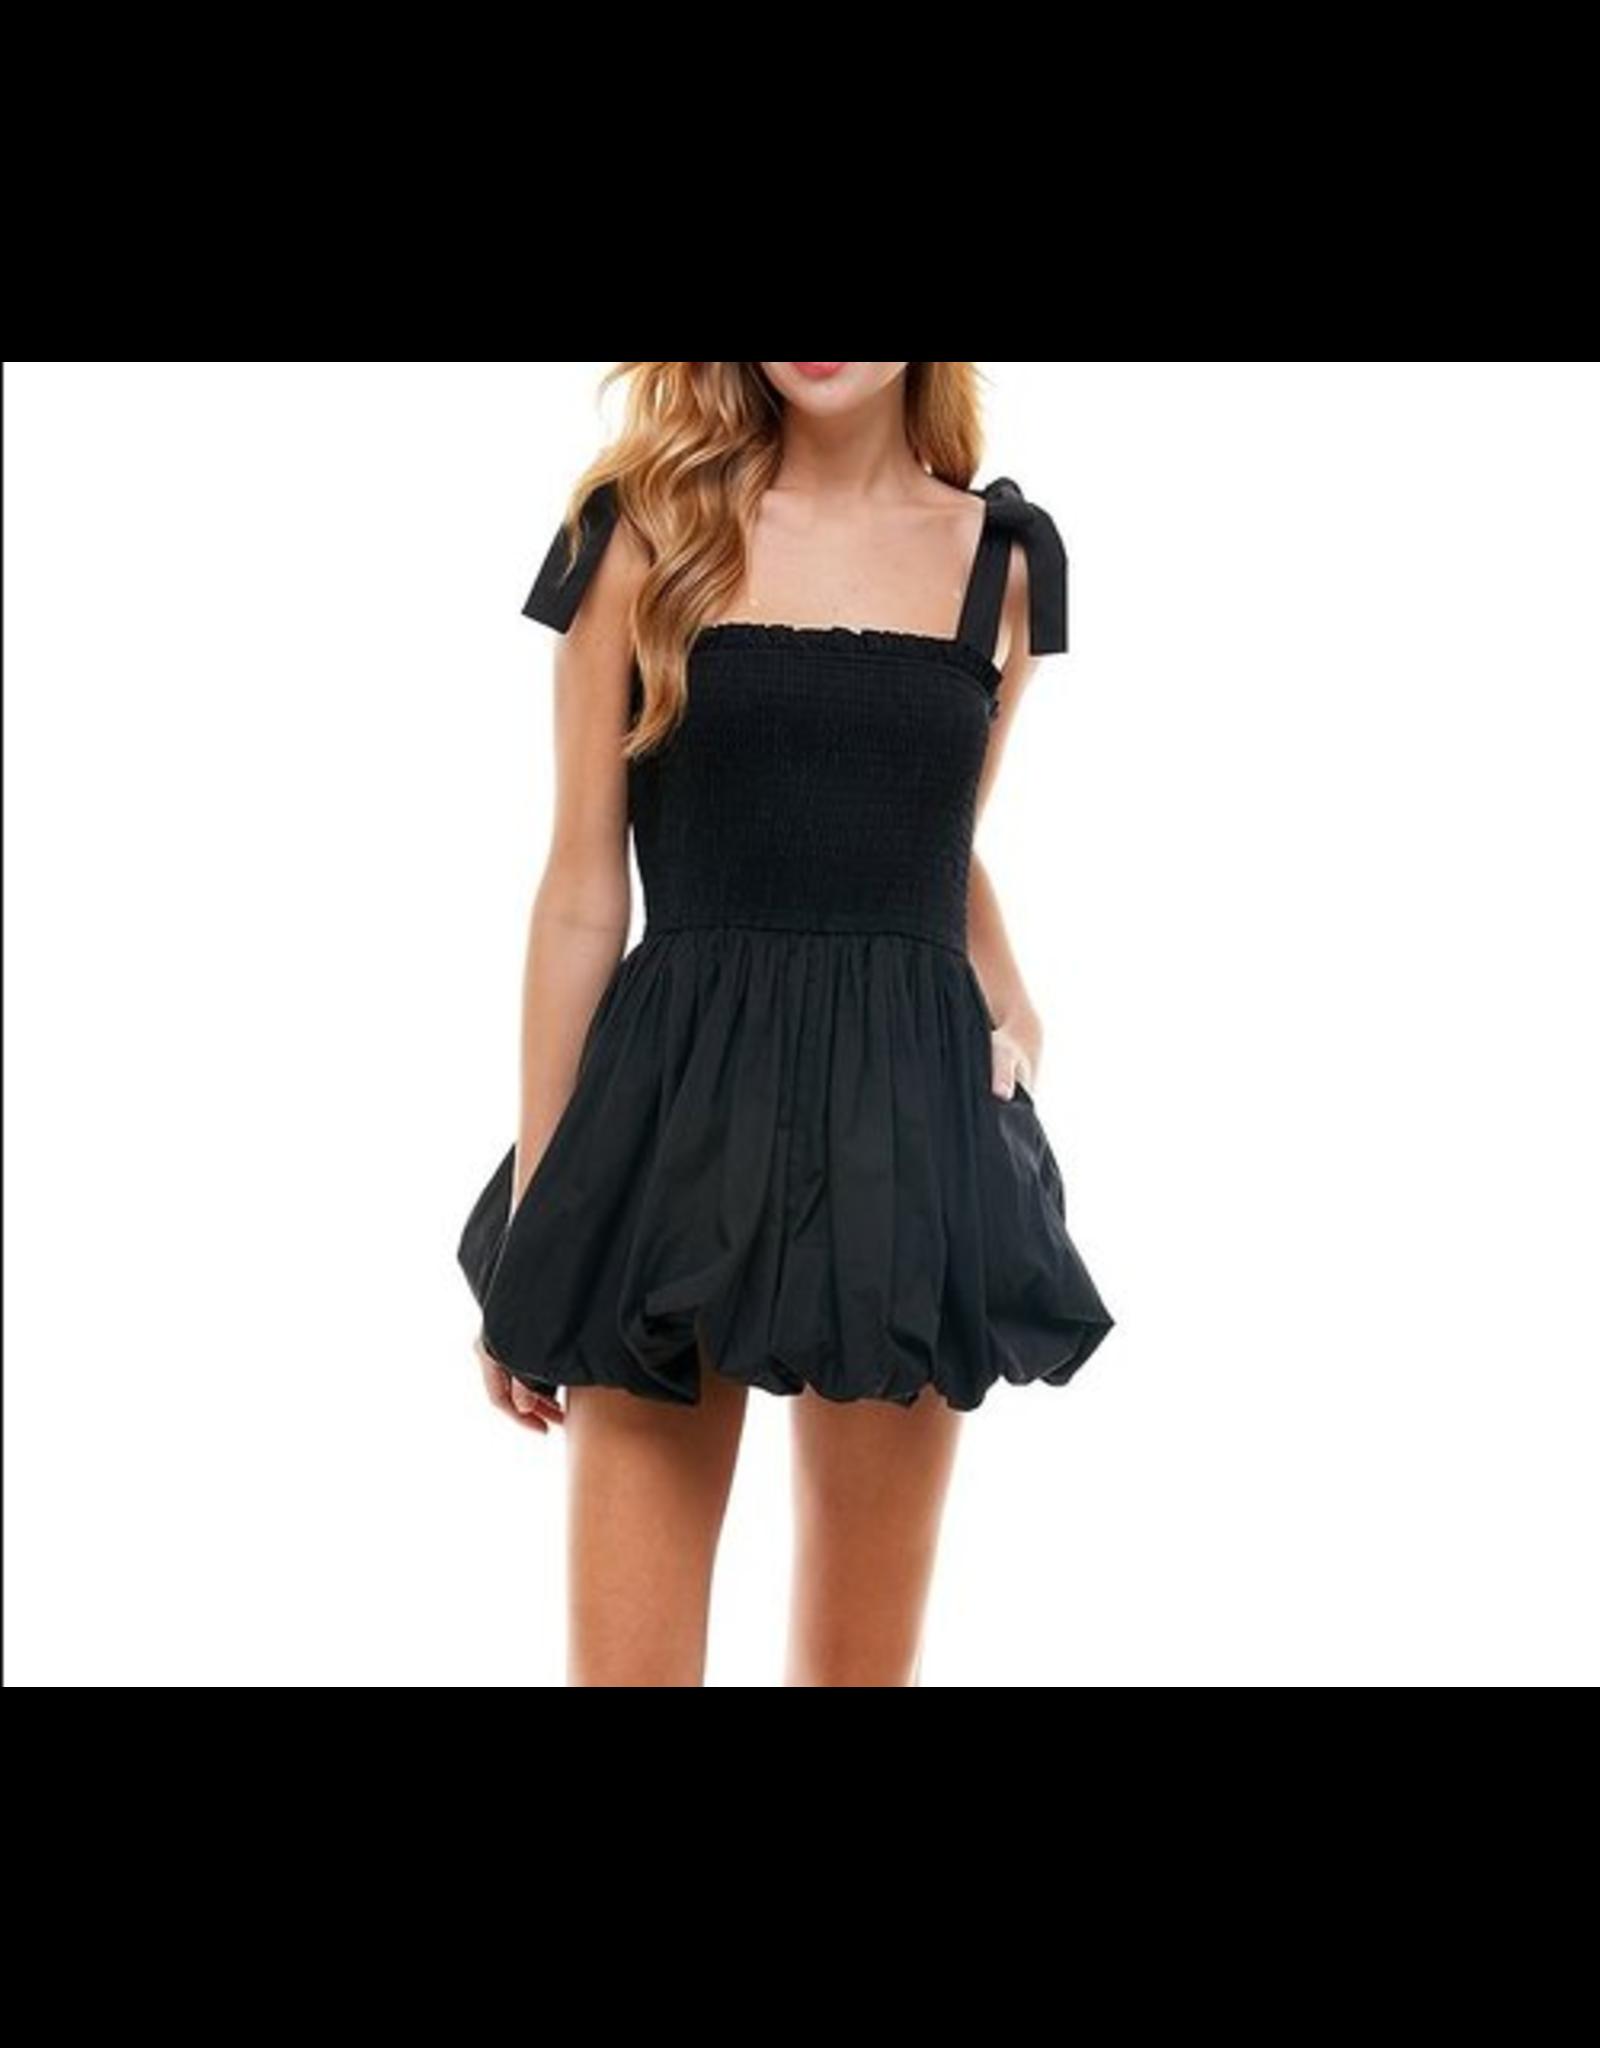 Bubble Dress - Black